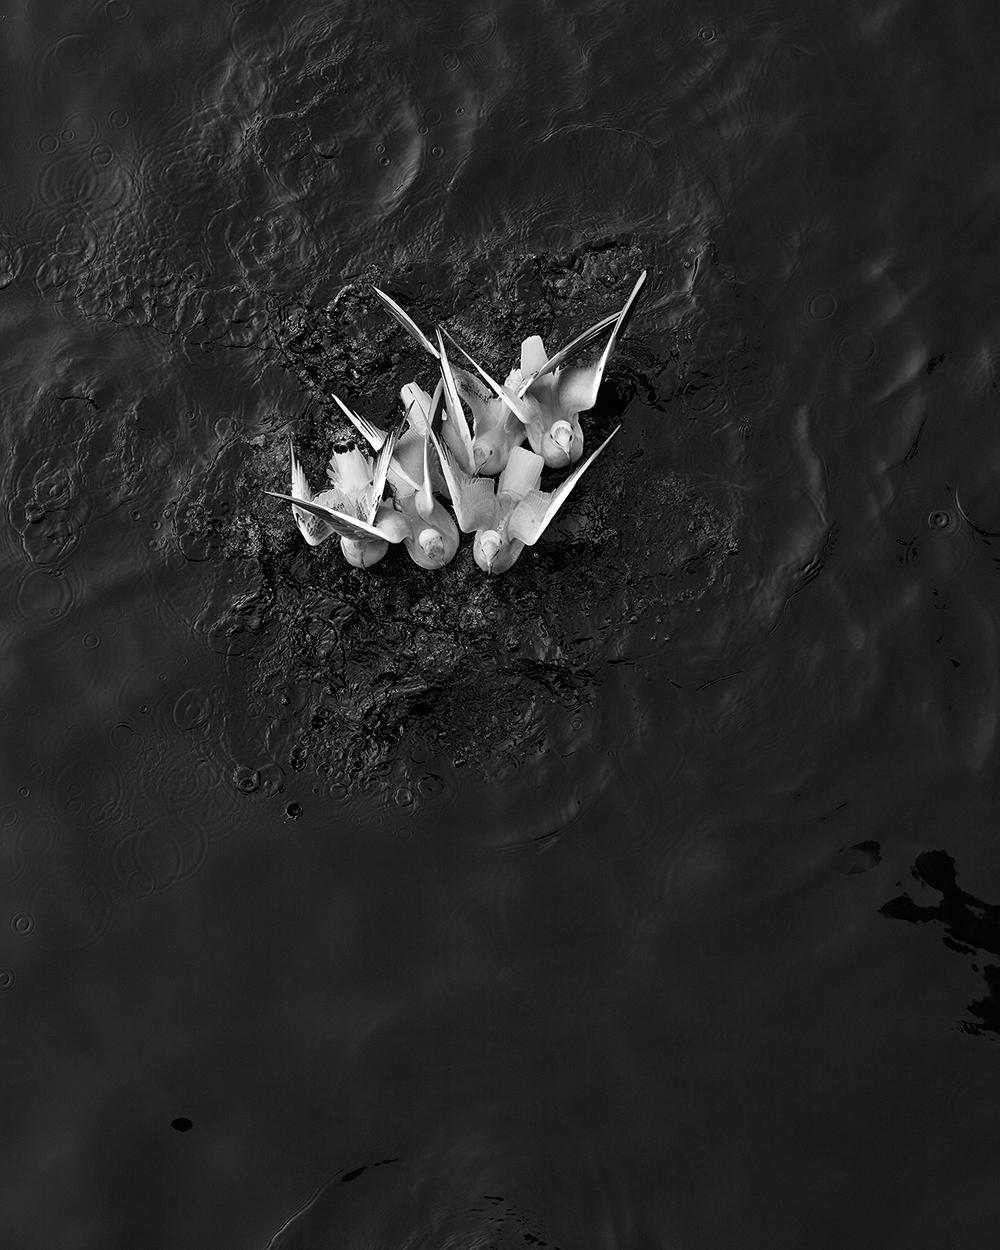 © Loredana Nemes – Greed #06, April 2014